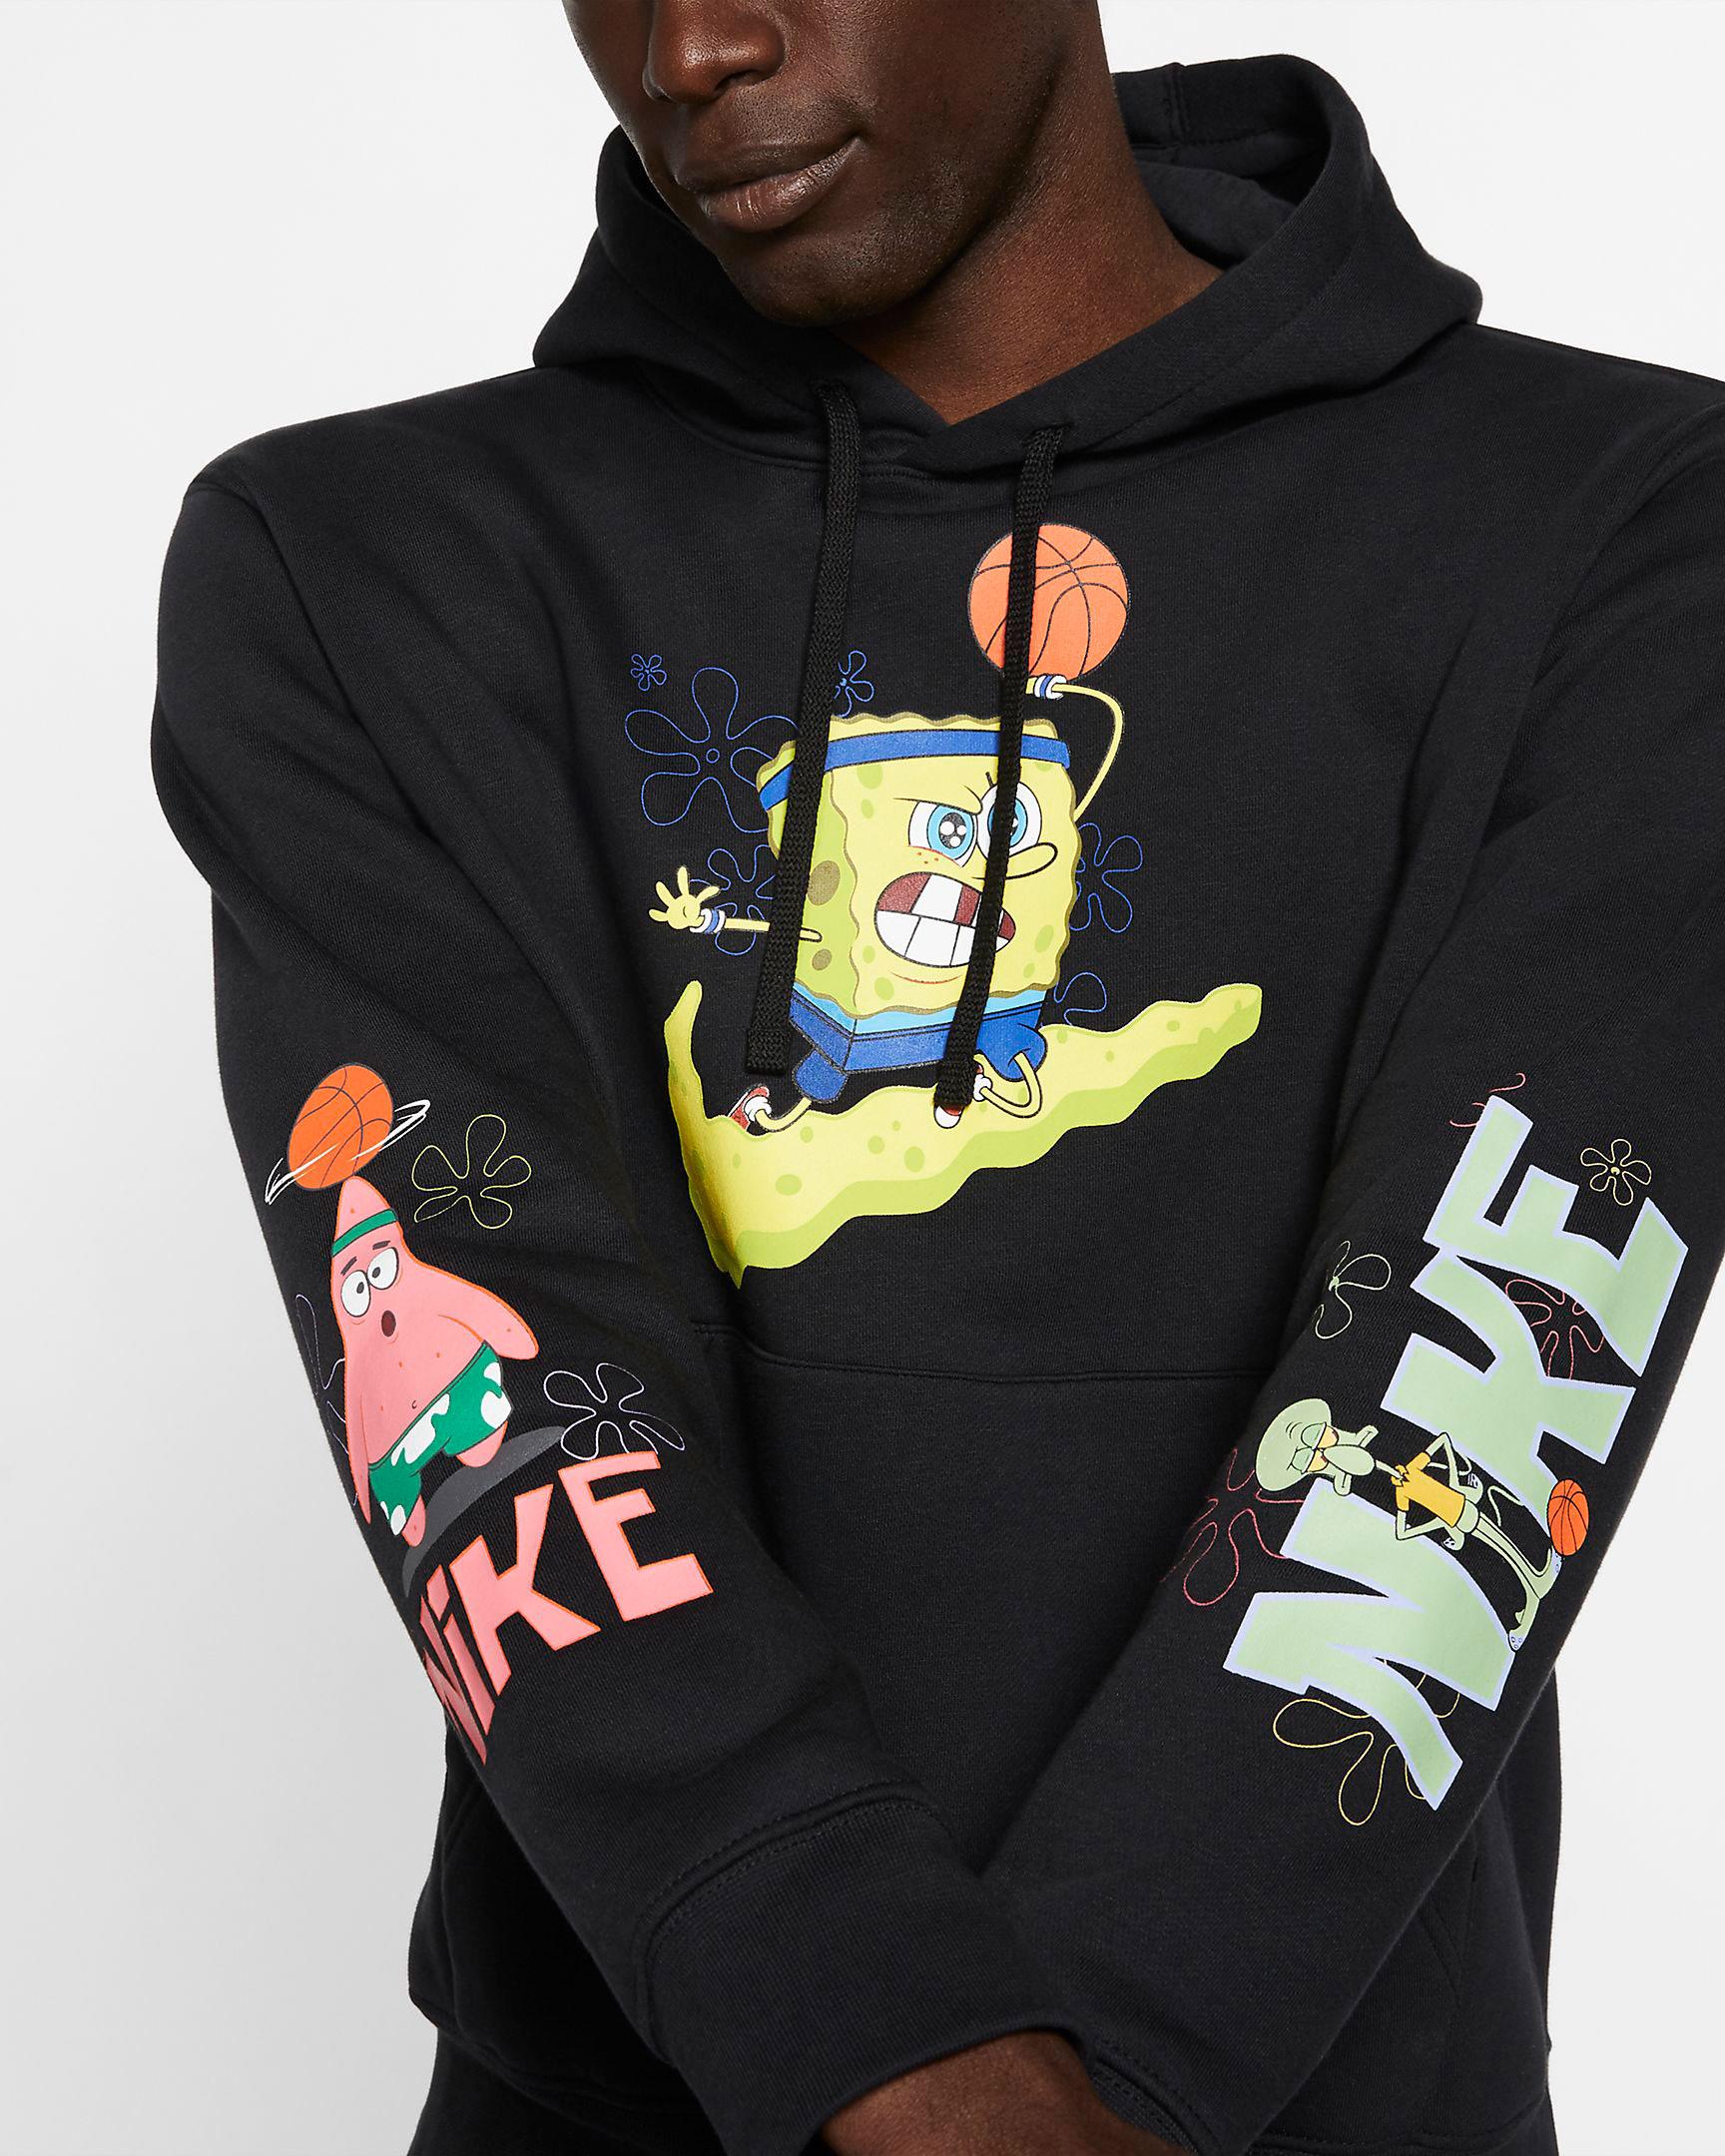 Nike Kyrie Spongebob Hoodies Now Available |